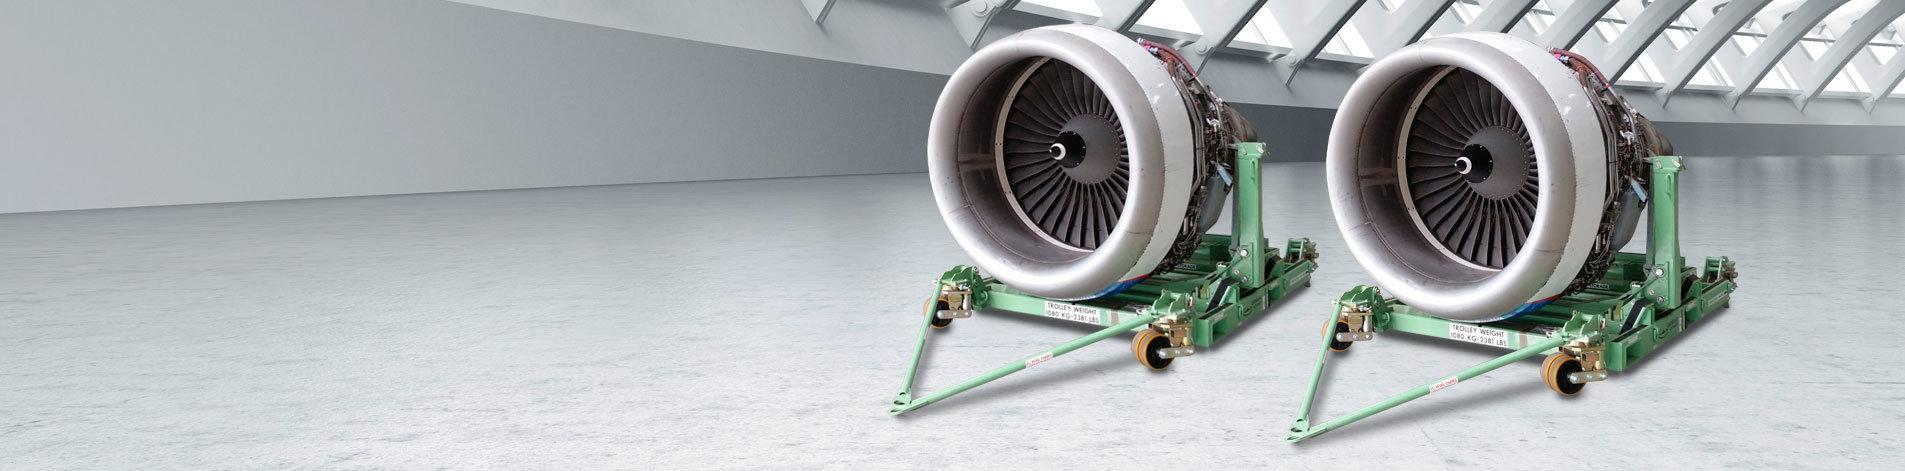 Dedienne-Aerospace-leasing-campaign